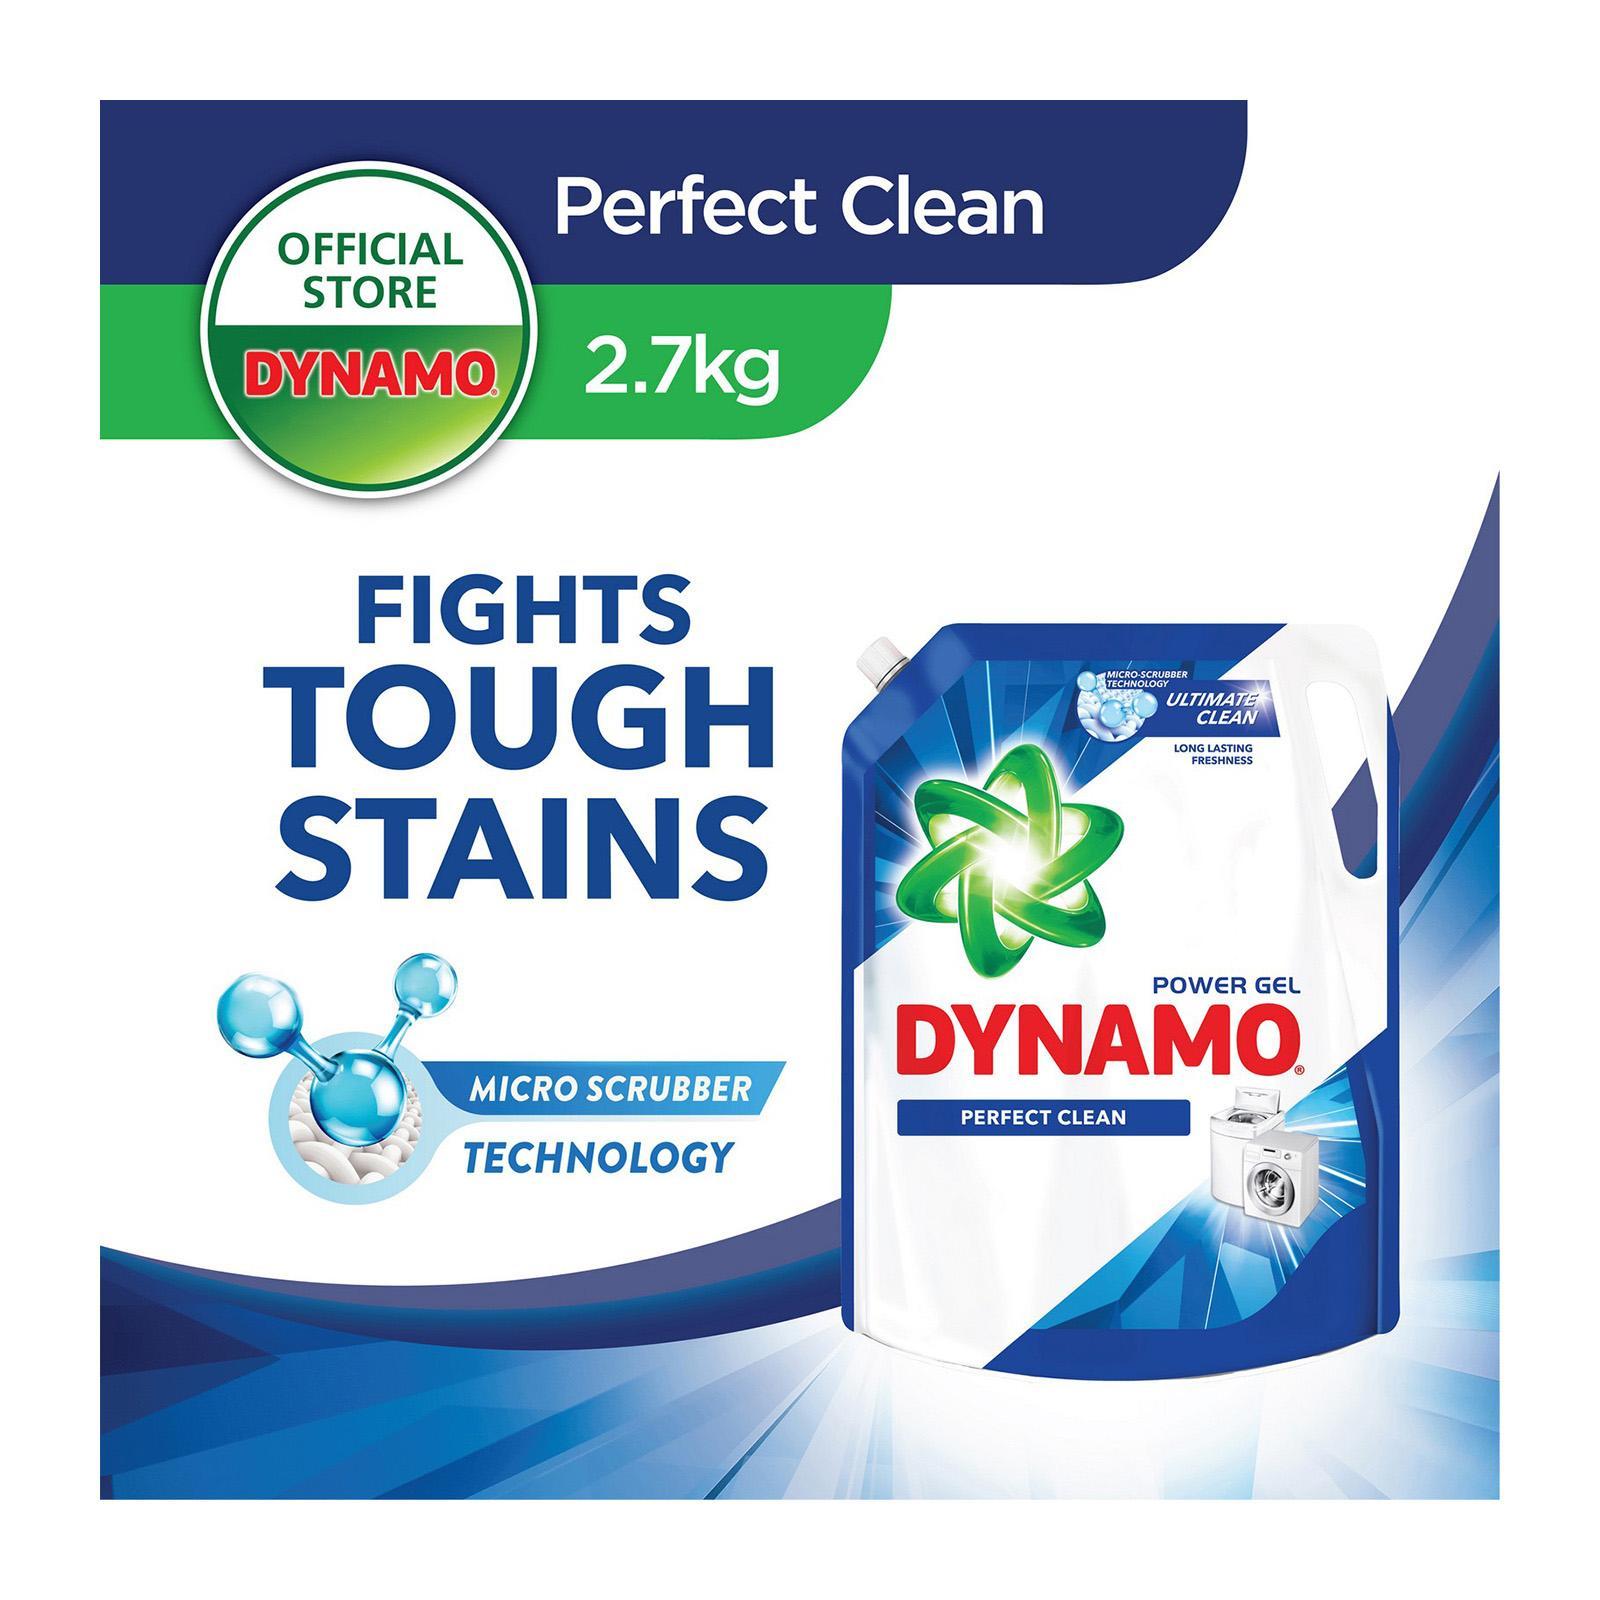 Dynamo Power Gel Regular Laundry Detergent Refill 2.7KG